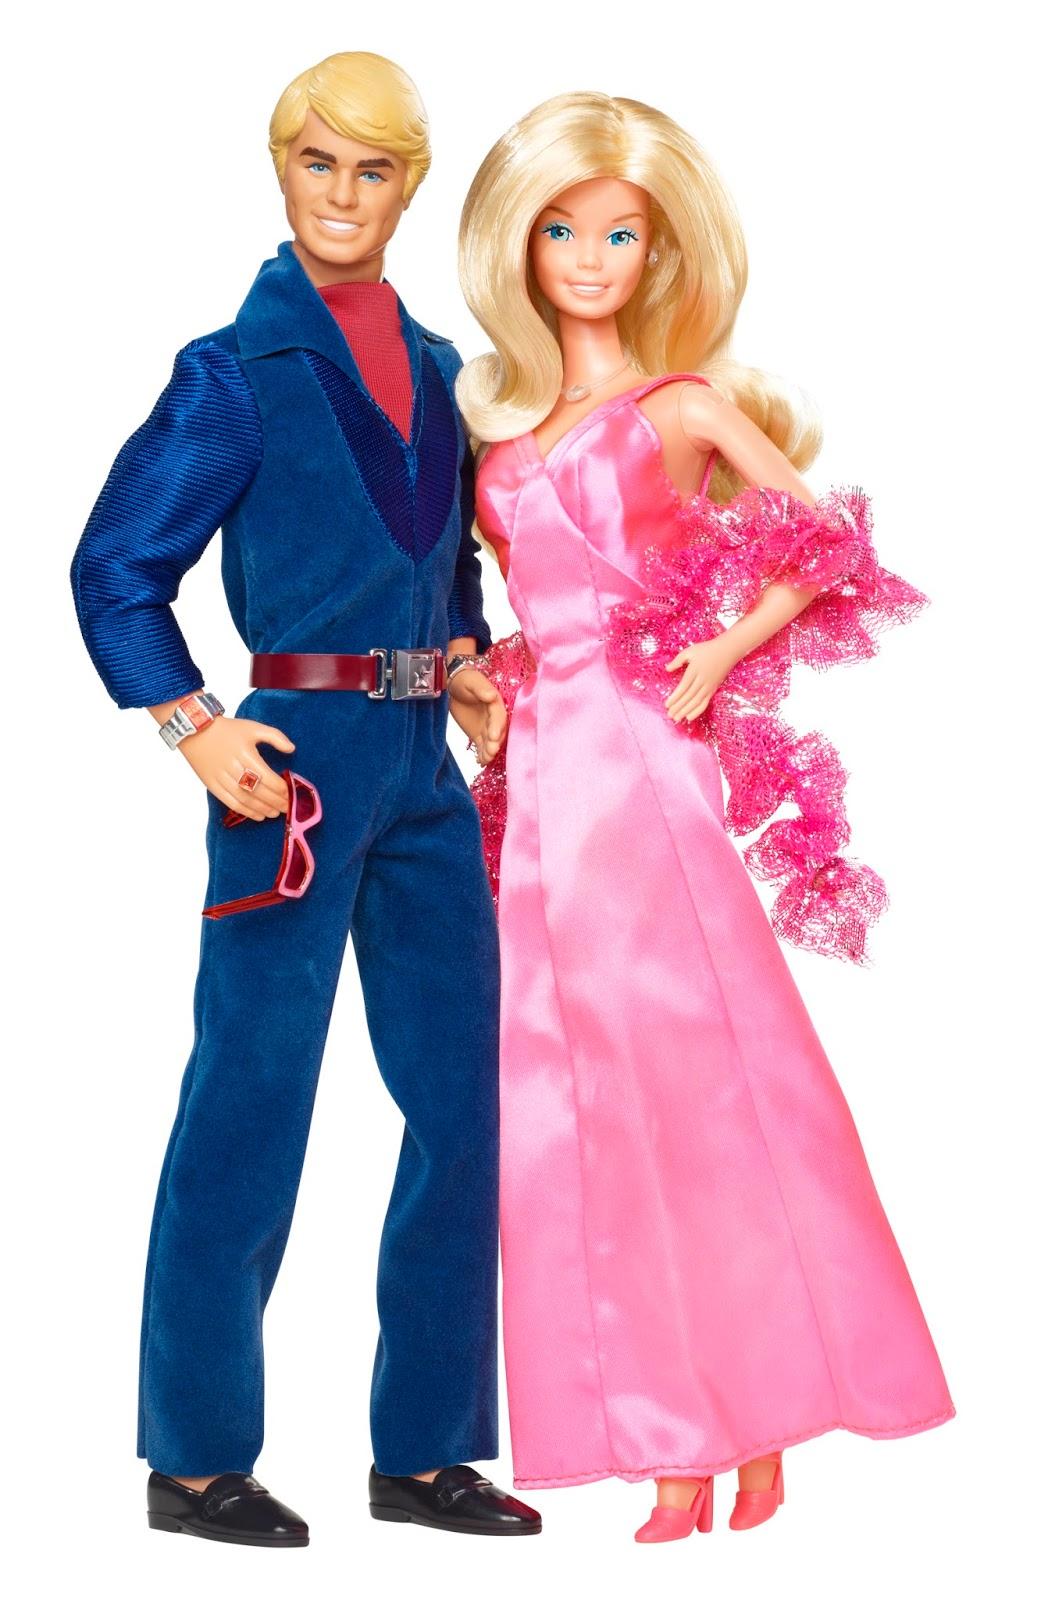 4k Barbie Dolls Wallpaper For Iphone - Barbie & Ken , HD Wallpaper & Backgrounds